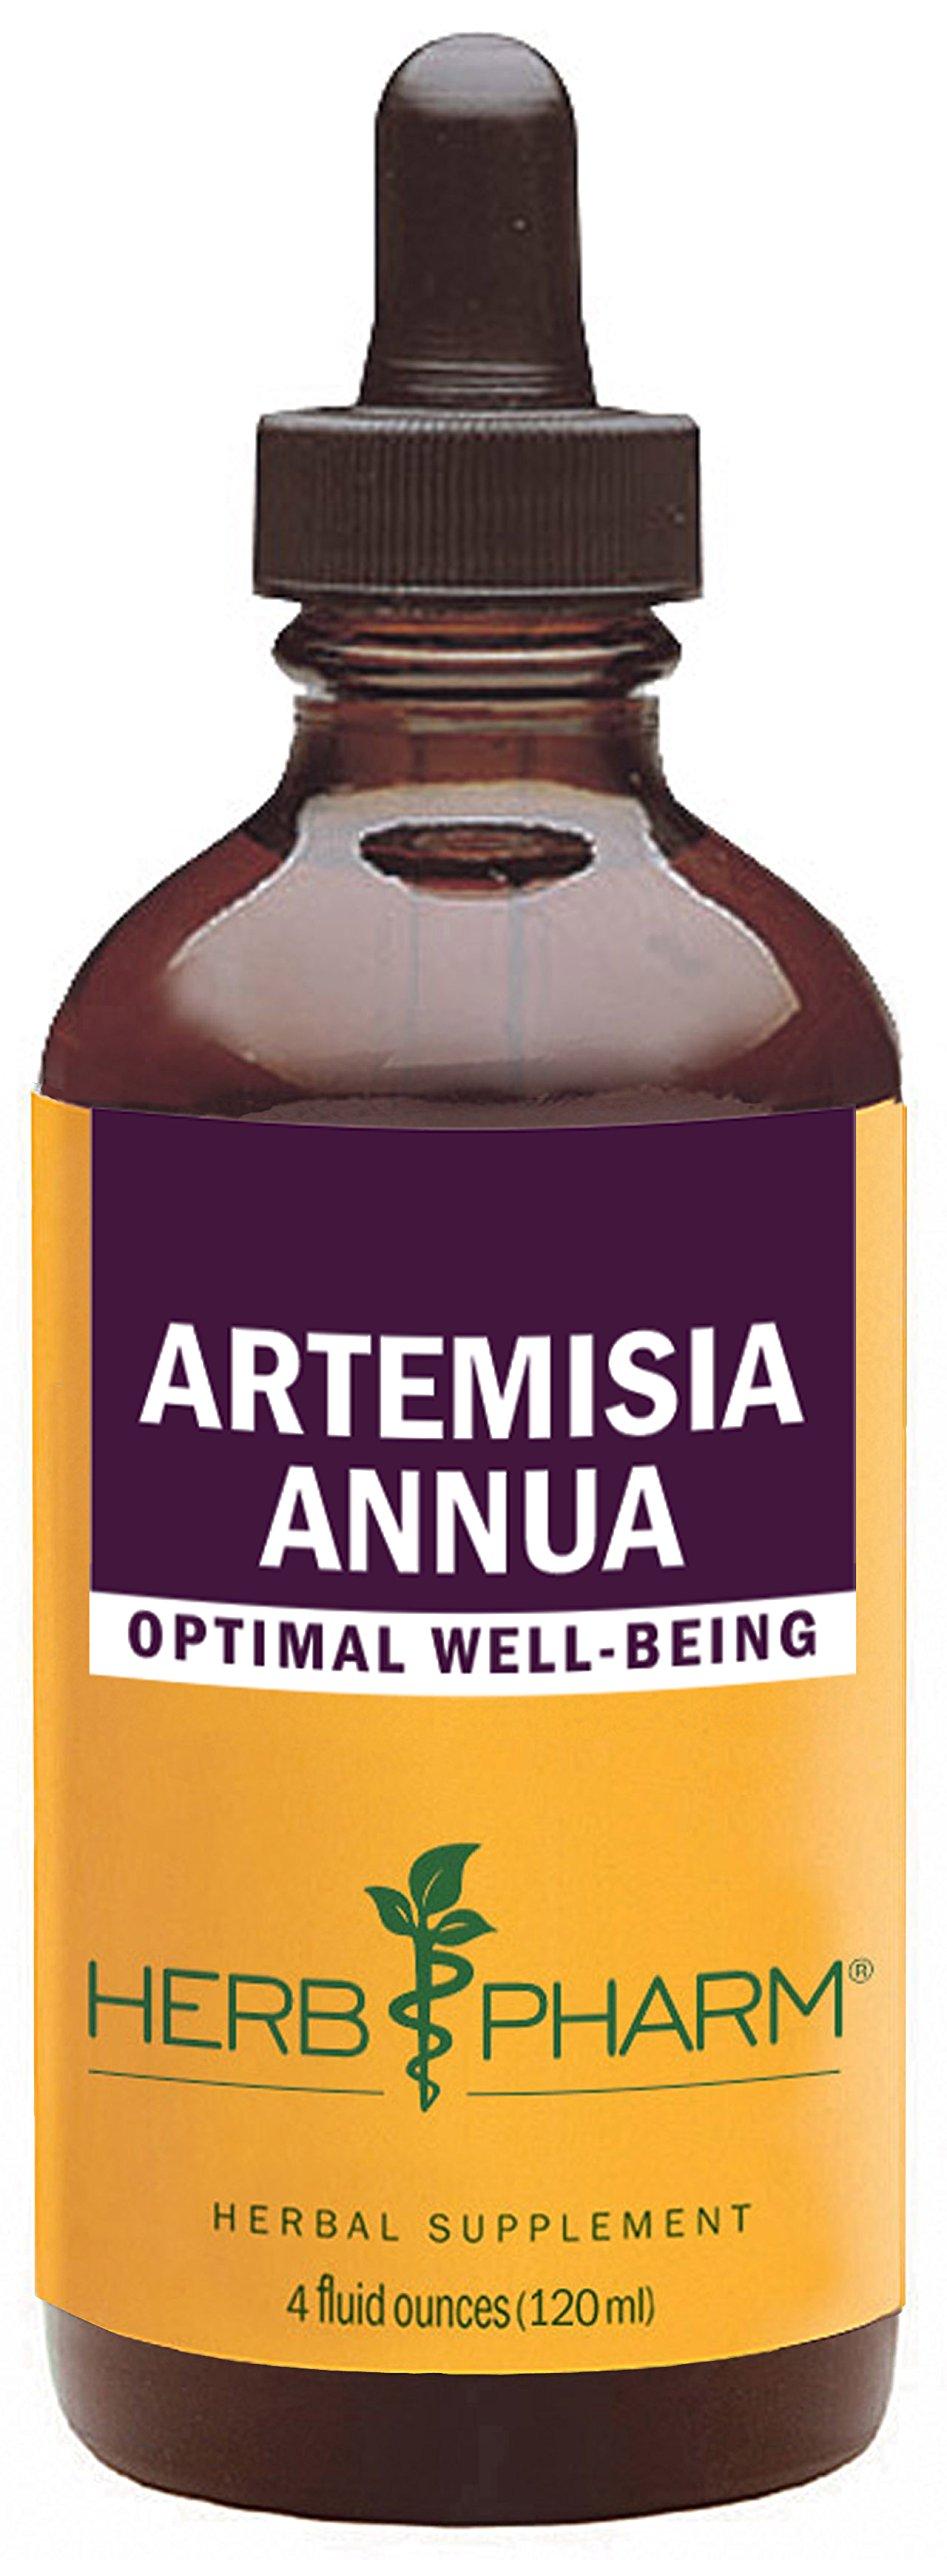 Herb Pharm Certified Organic Artemisia Annua (Sweet Annie) Liquid Extract - 4 Ounce